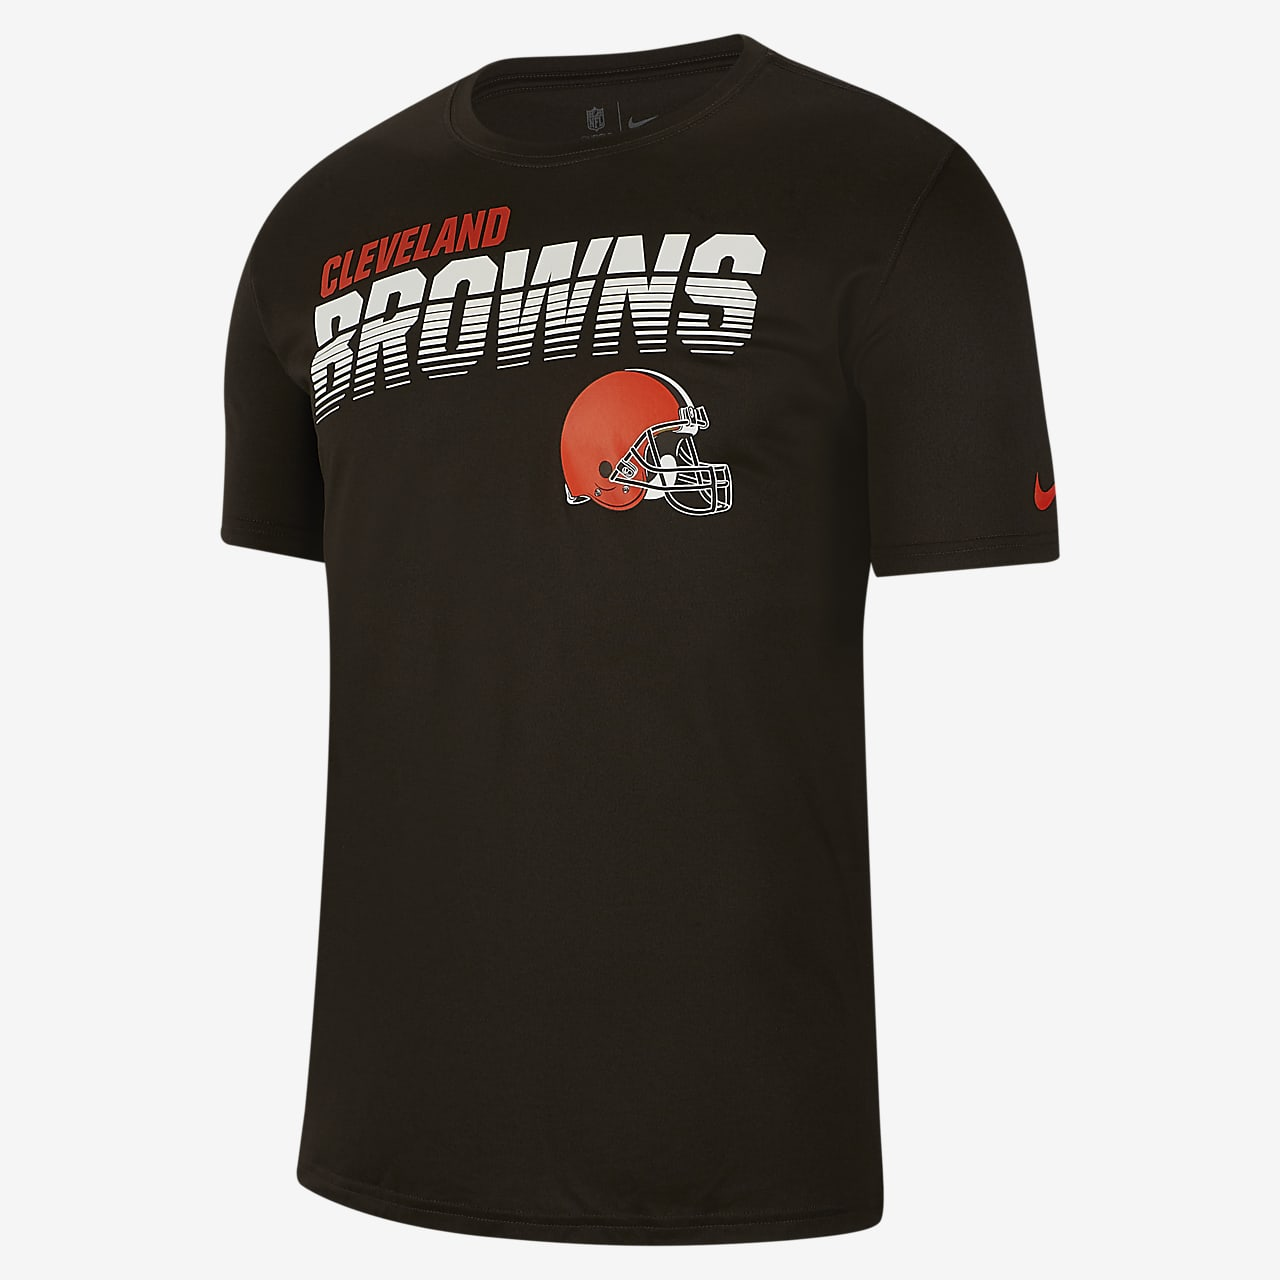 Playera de manga larga para hombre Nike Legend (NFL Browns)